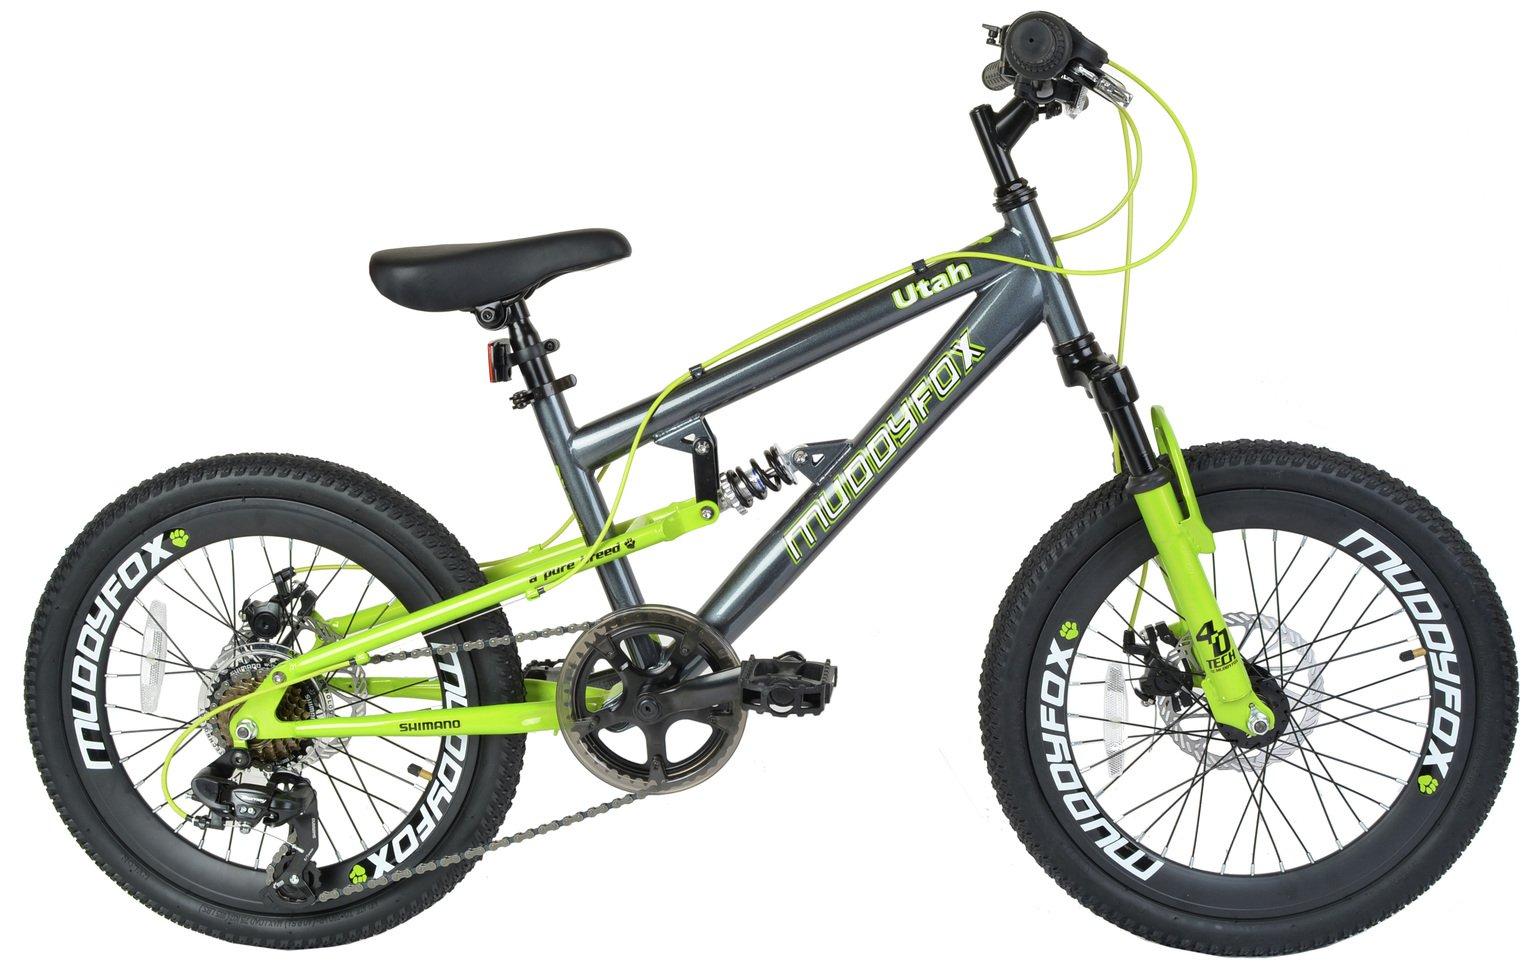 Muddyfox Utah 20 Inch Dual Supsension Kids Bike